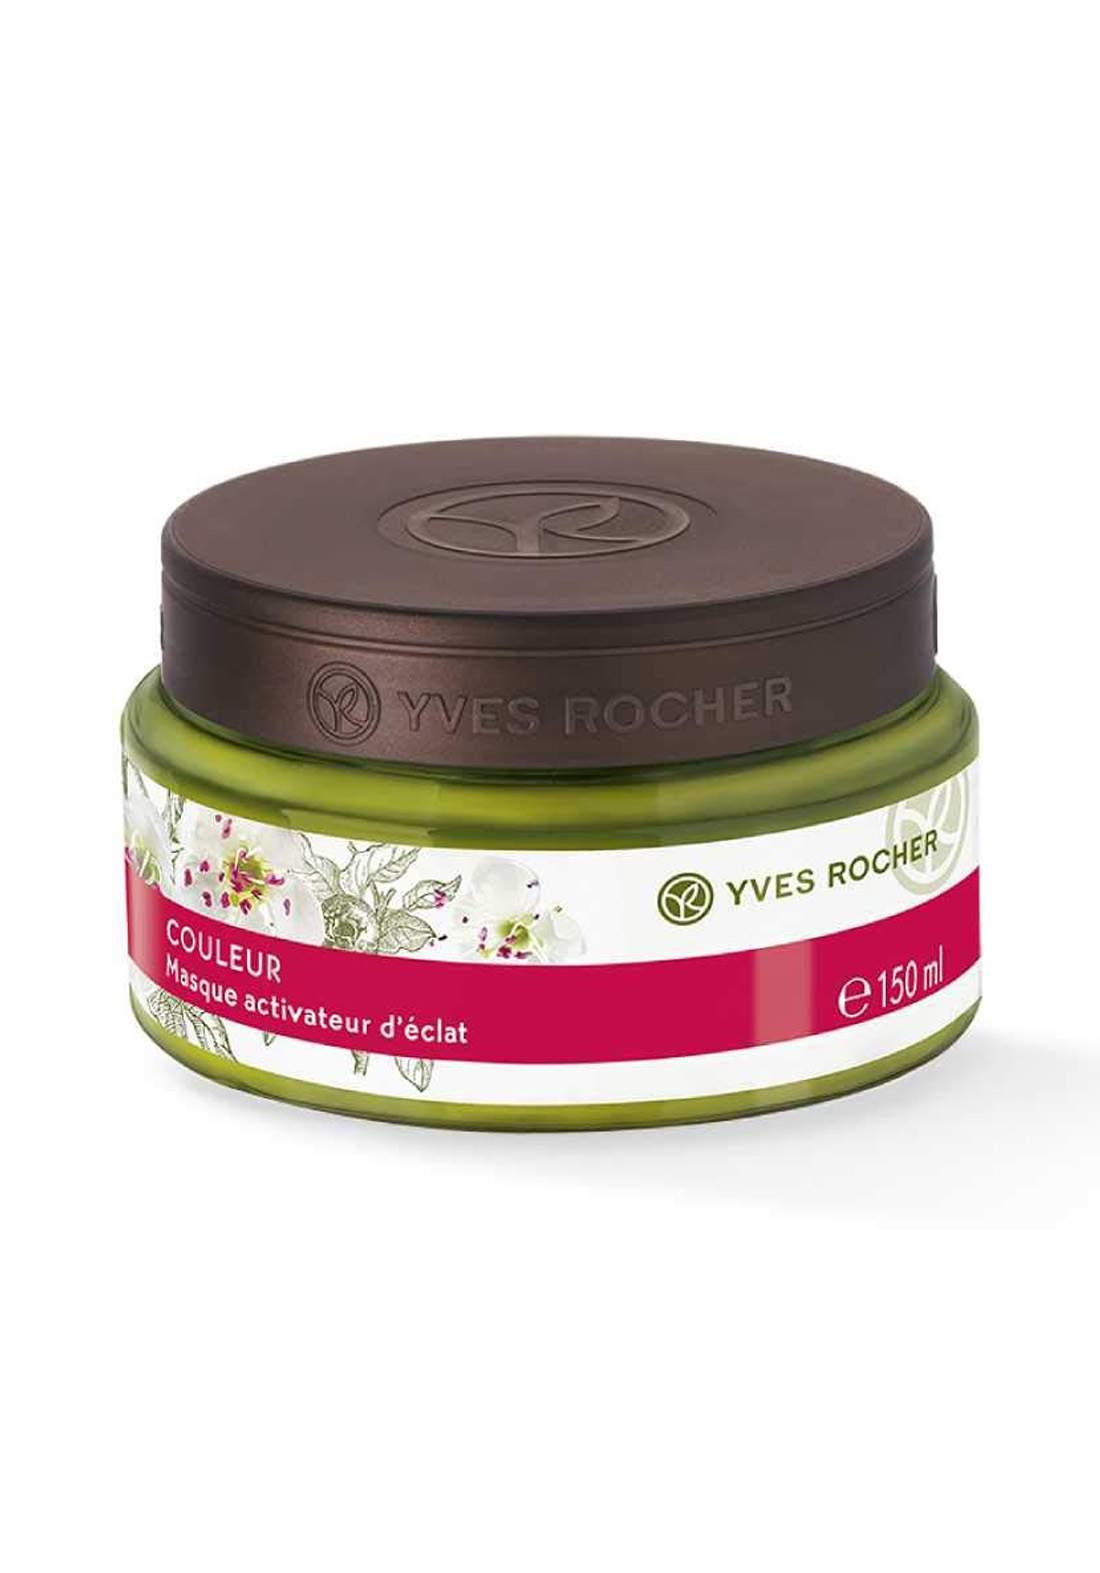 Yves Rocher 54623 Protect and Shine Color Treated Hair Mask 150ml قناع العناية للشعر المصبوغ